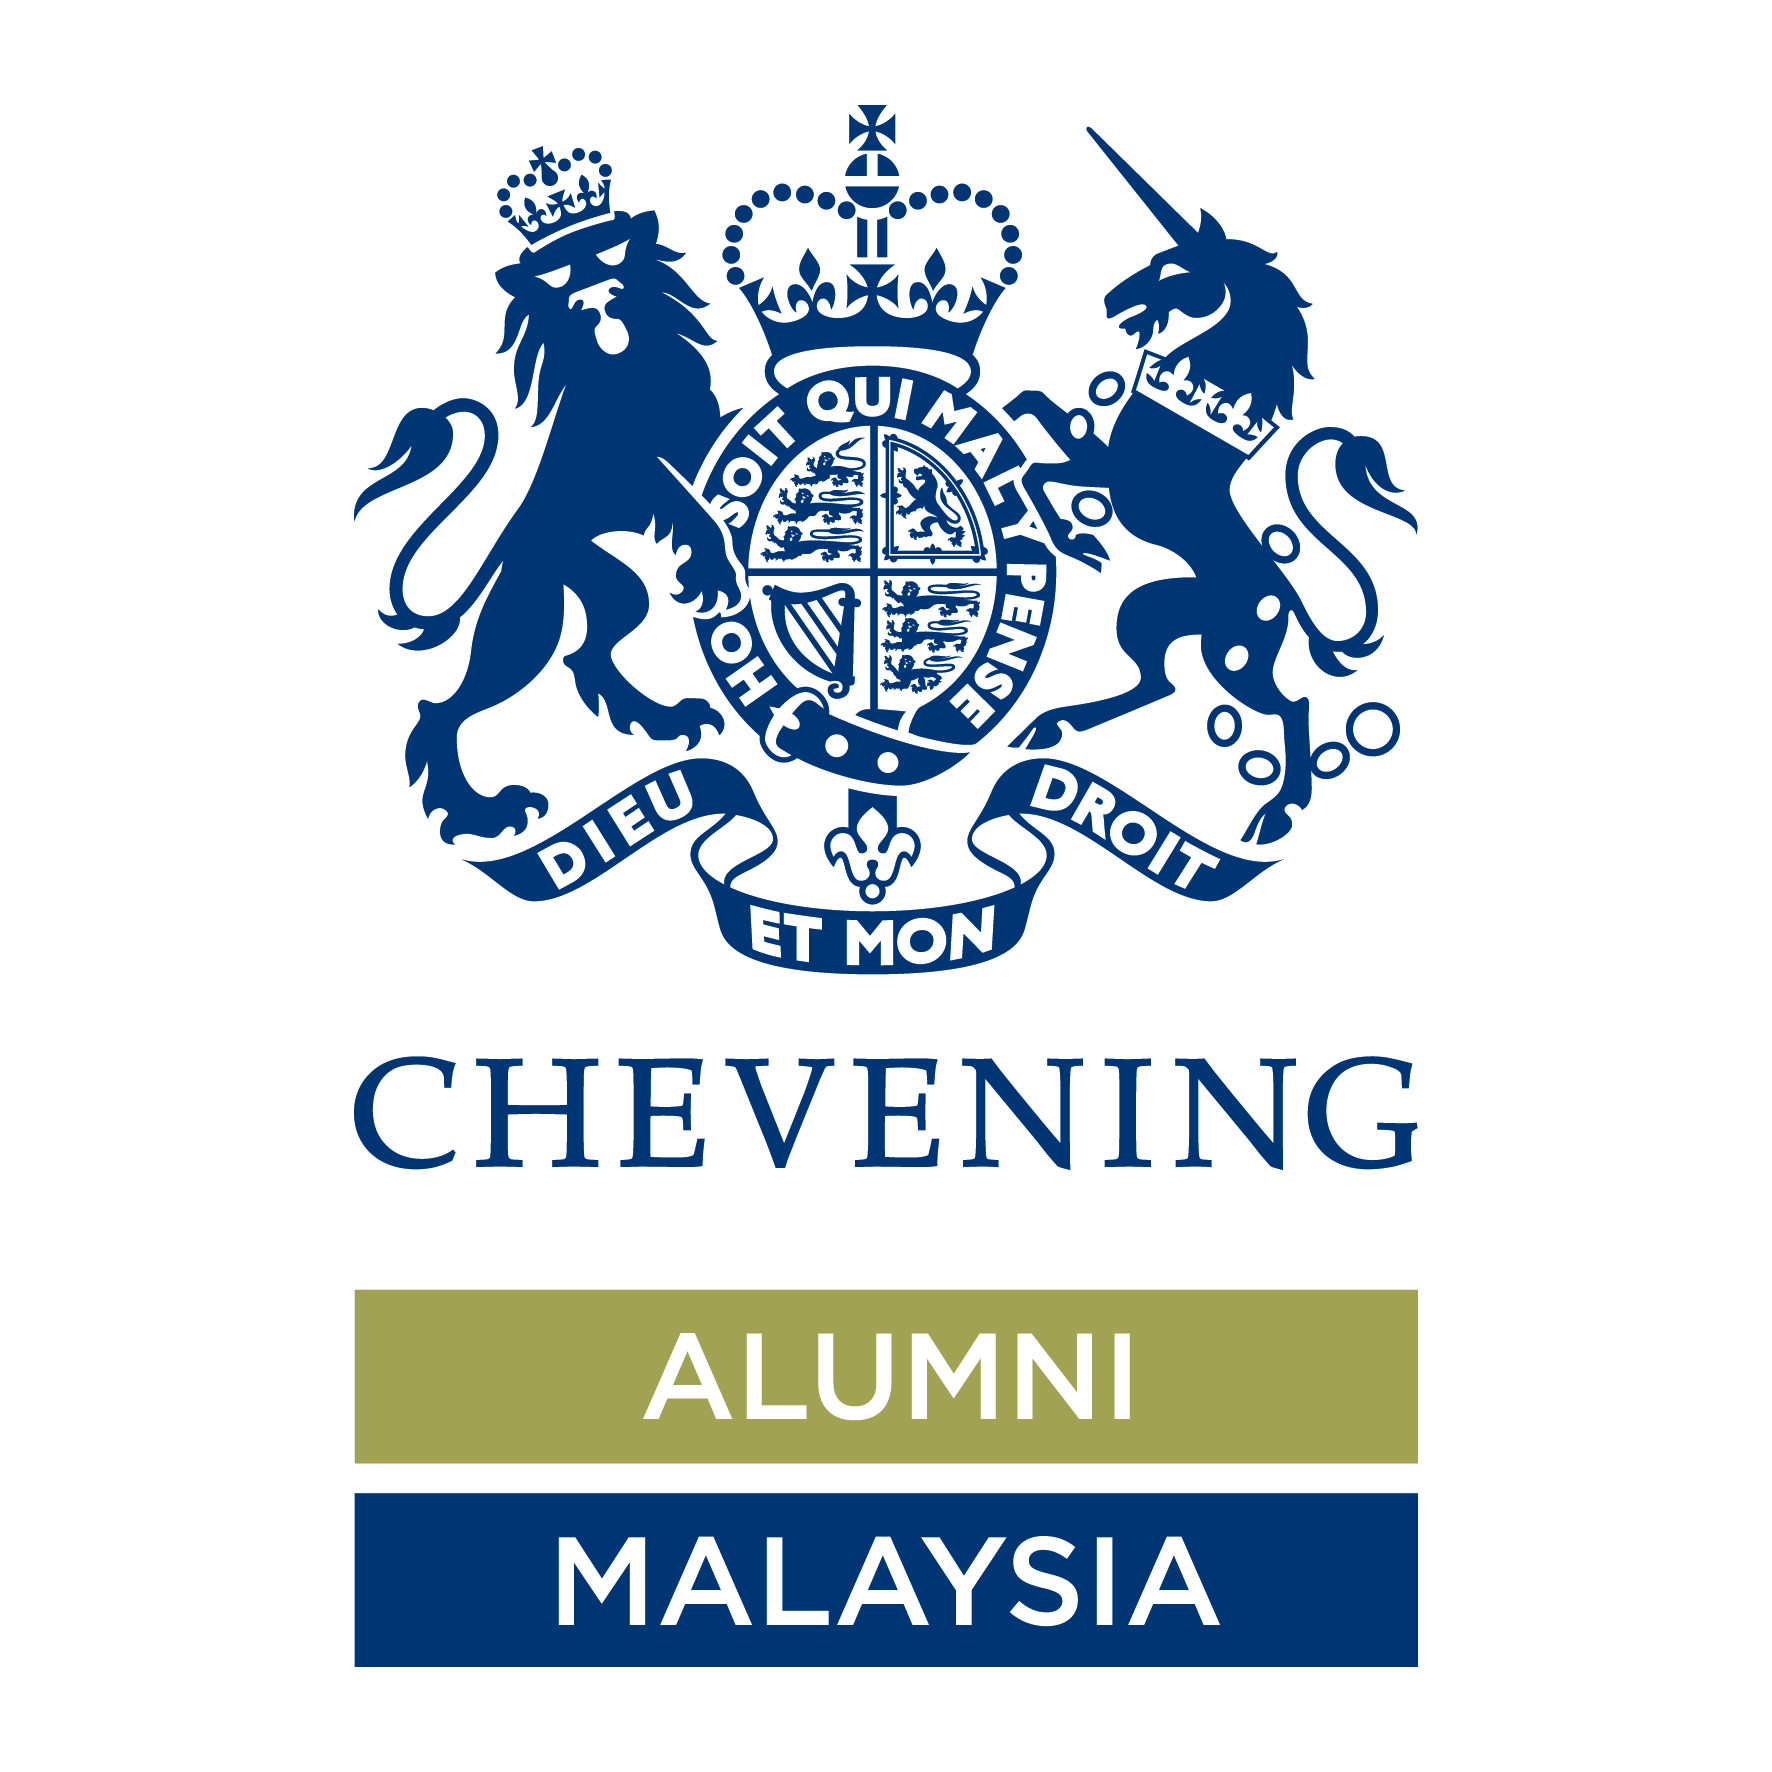 Chevening Alumni Malaysia